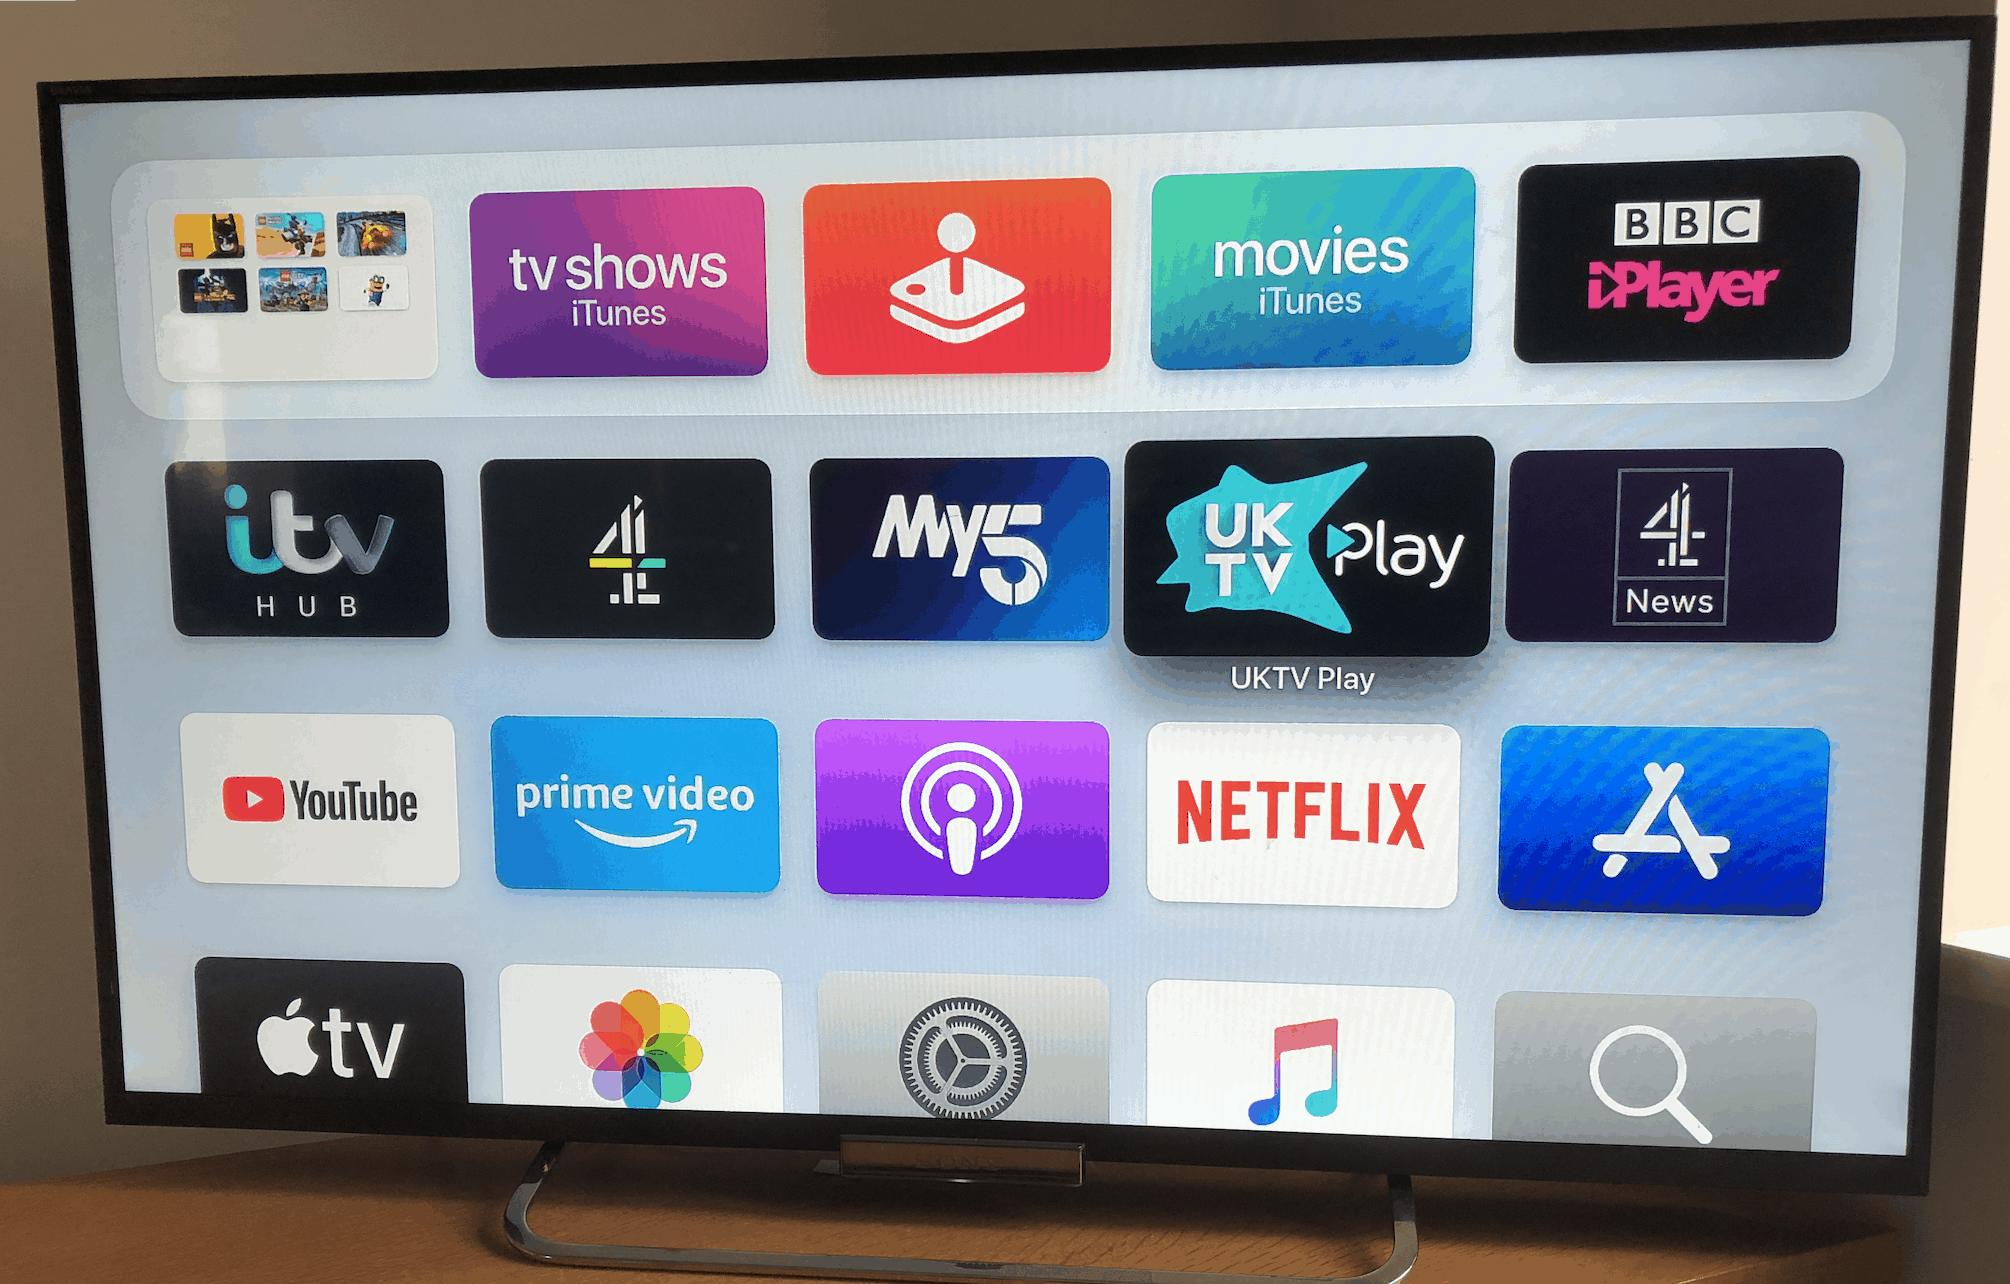 Apple TV FAQ